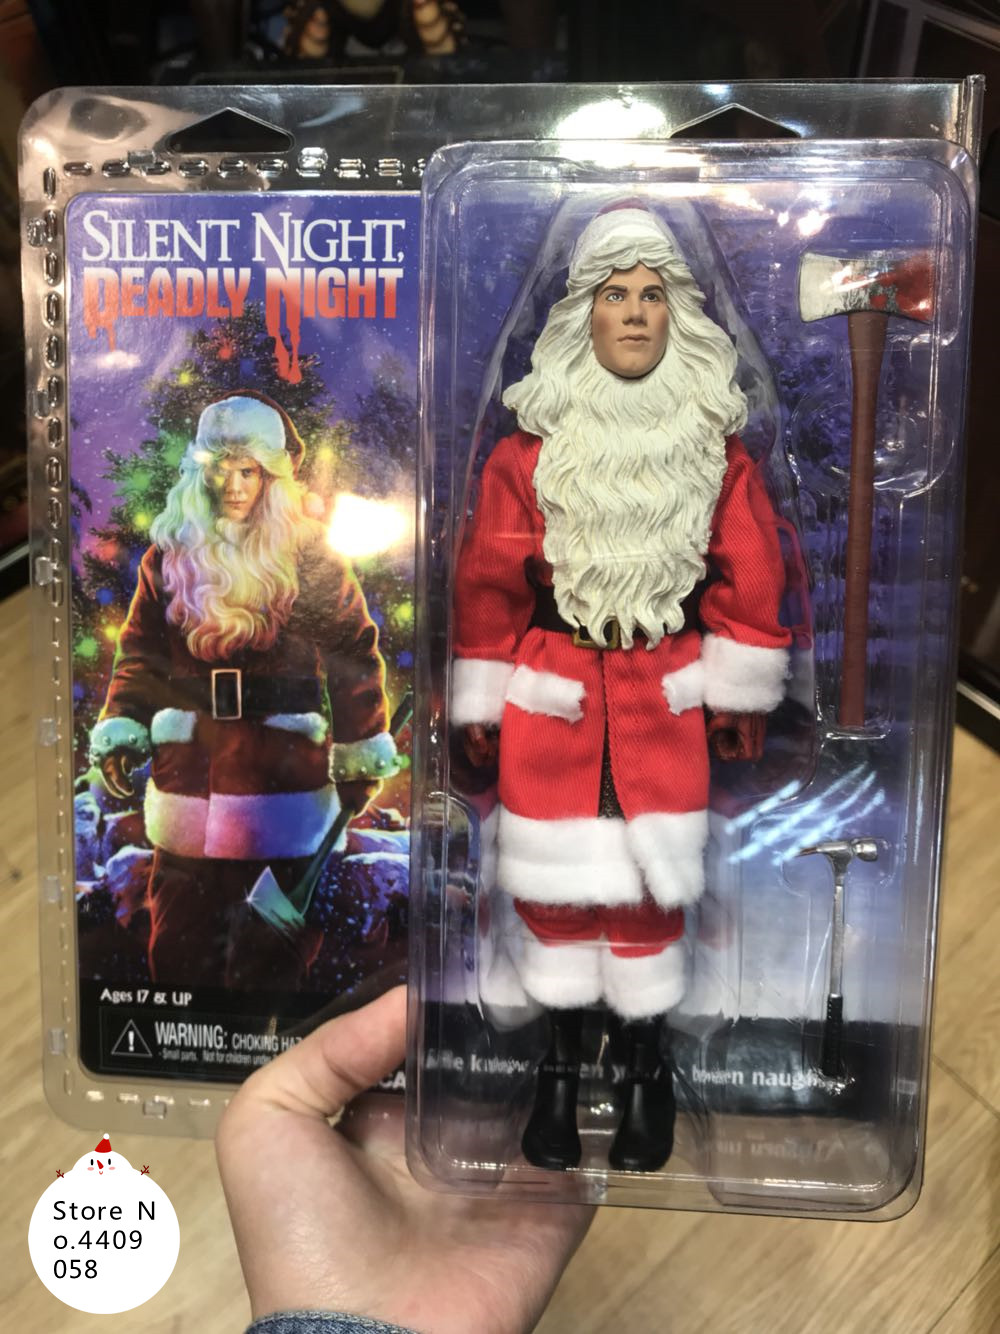 NECA Fiber Cloth Retro Series Christmas Night Silent Night Deadly Night Killer Movie Alloy Action Figure Model Toy r l stine silent night a christmas suspense story